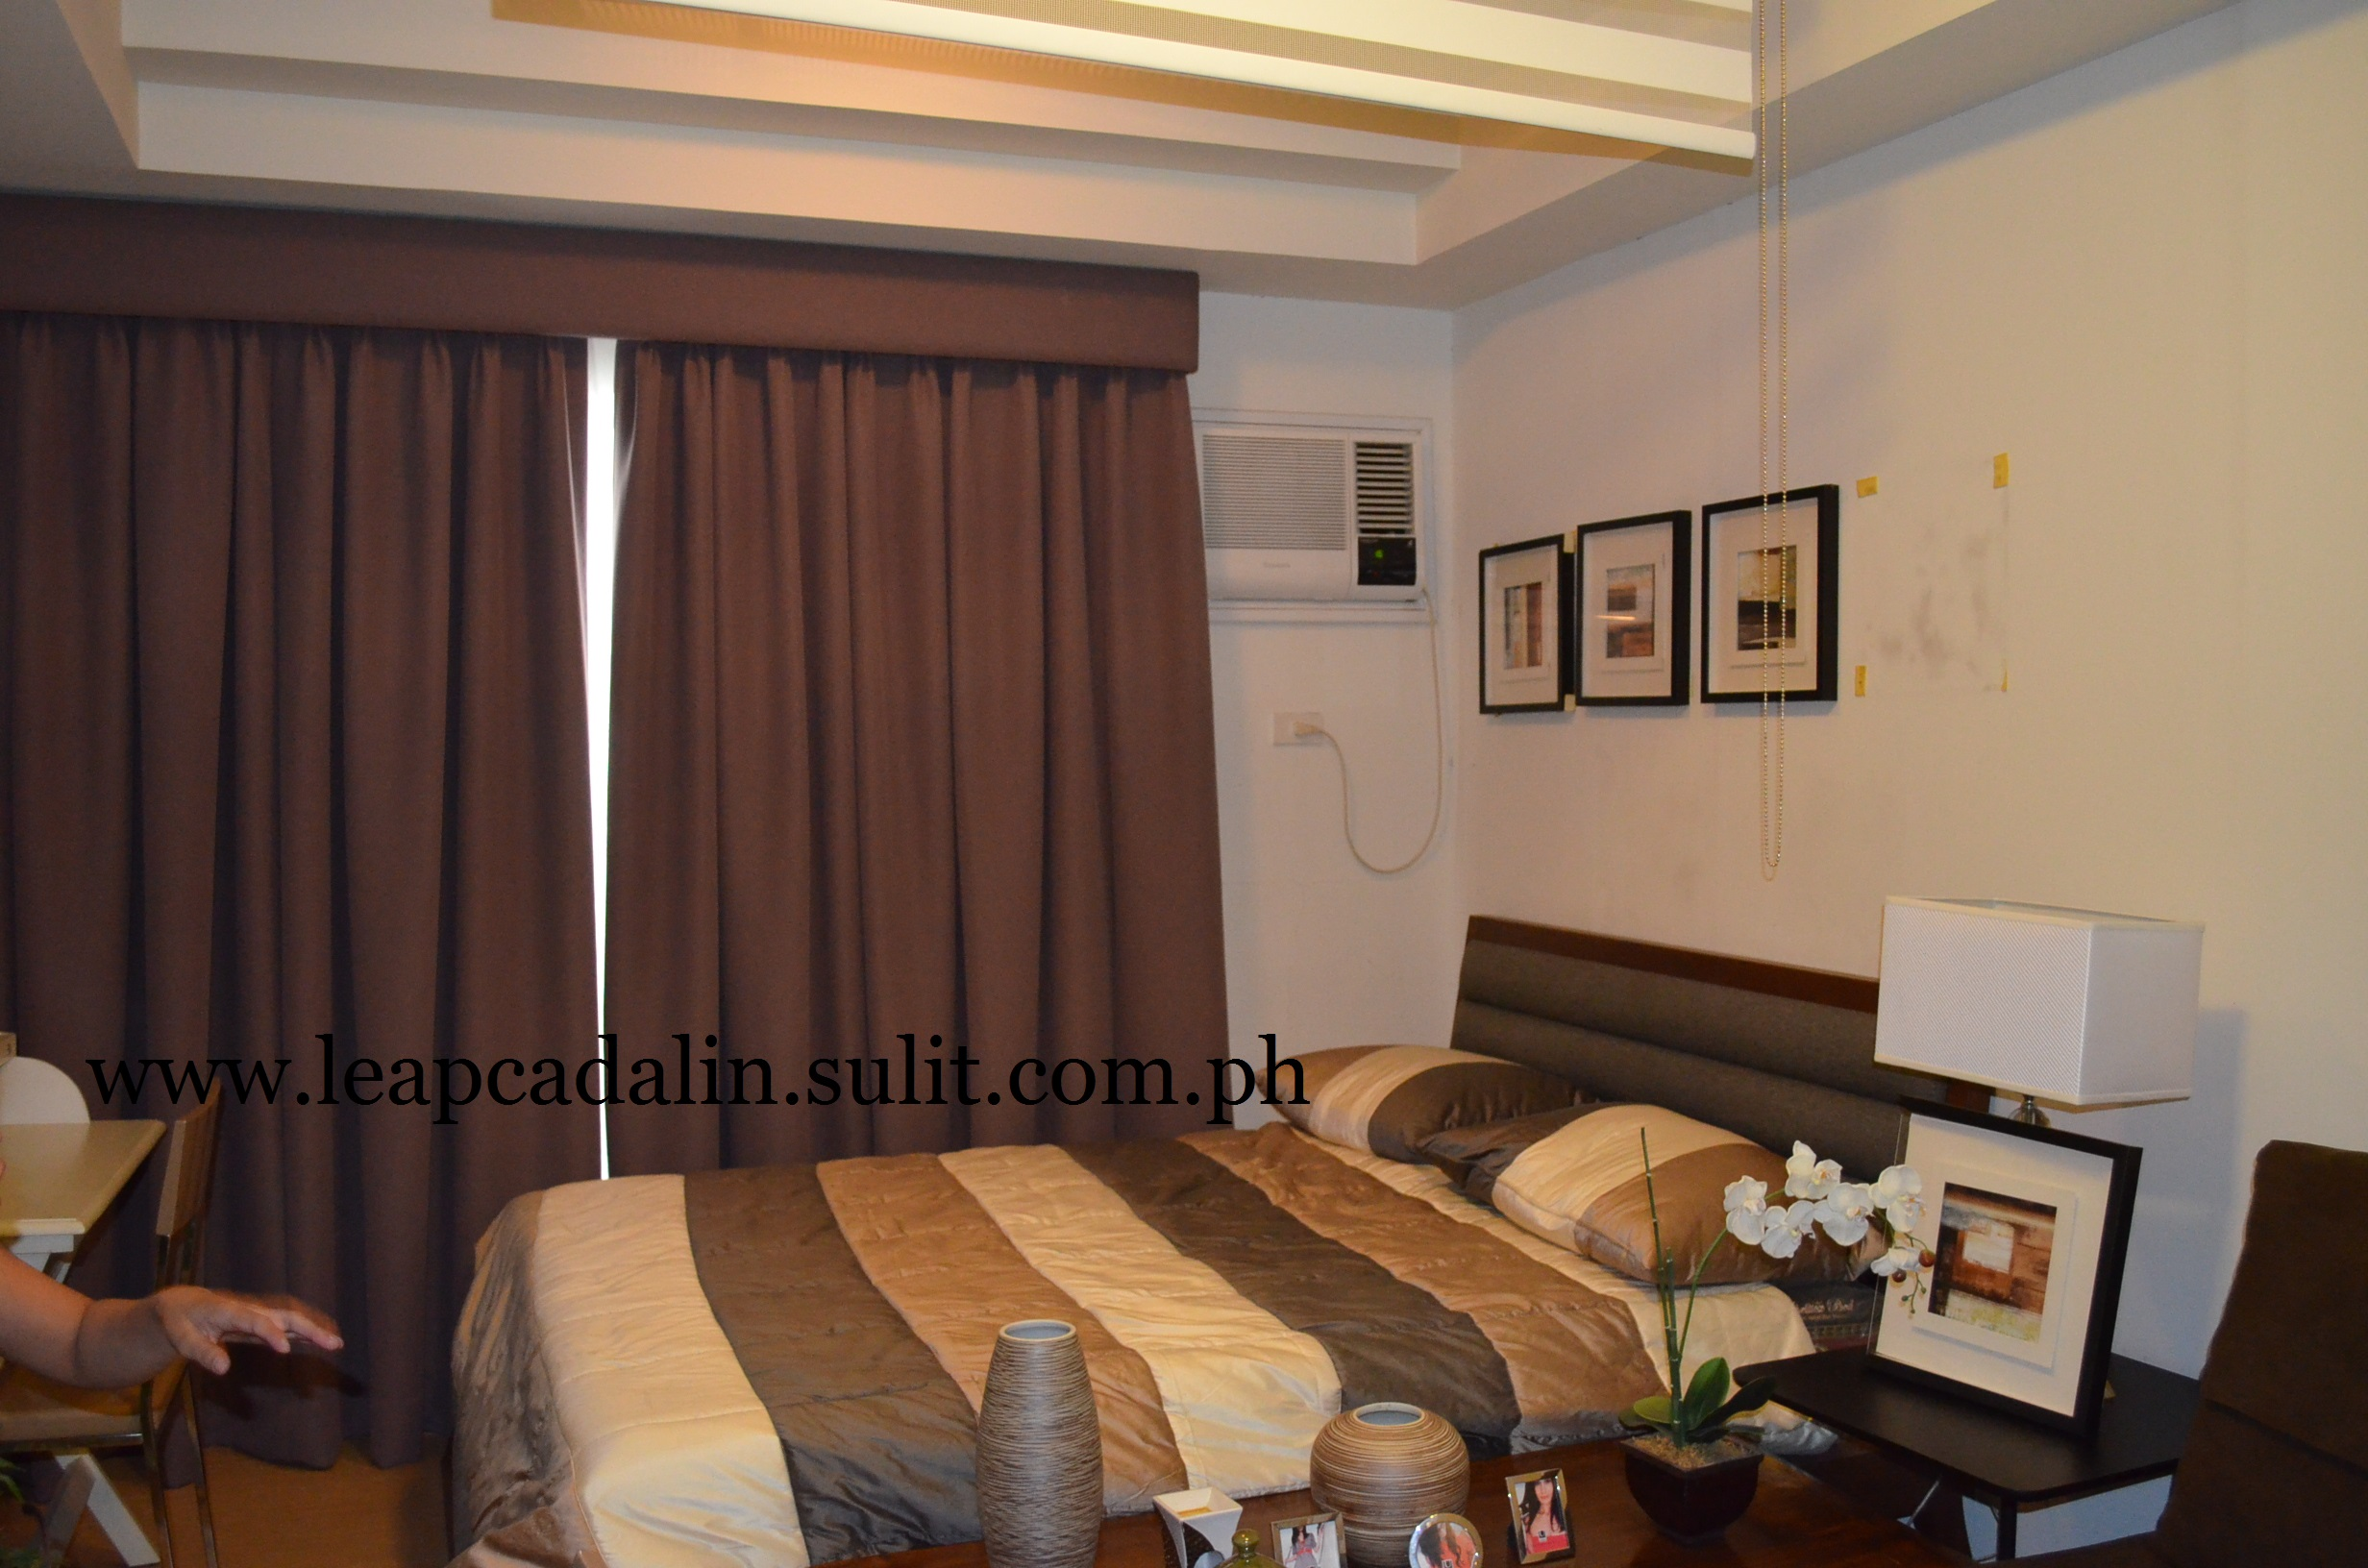 FOR SALE: Apartment / Condo / Townhouse Rizal > Cainta 2